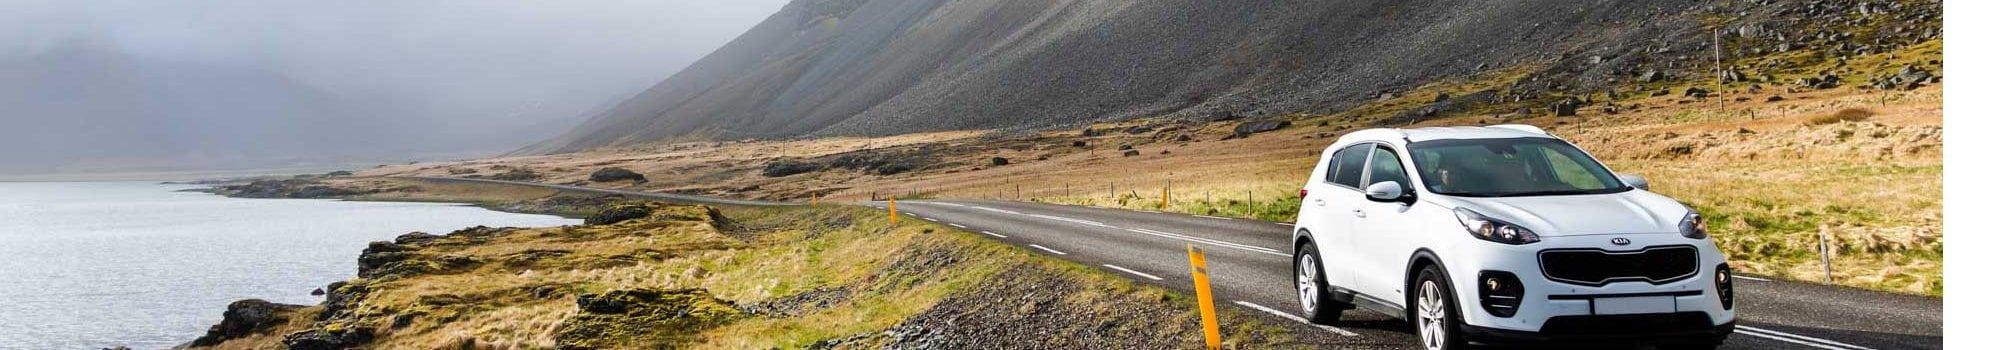 Ring Road Tour, Iceland